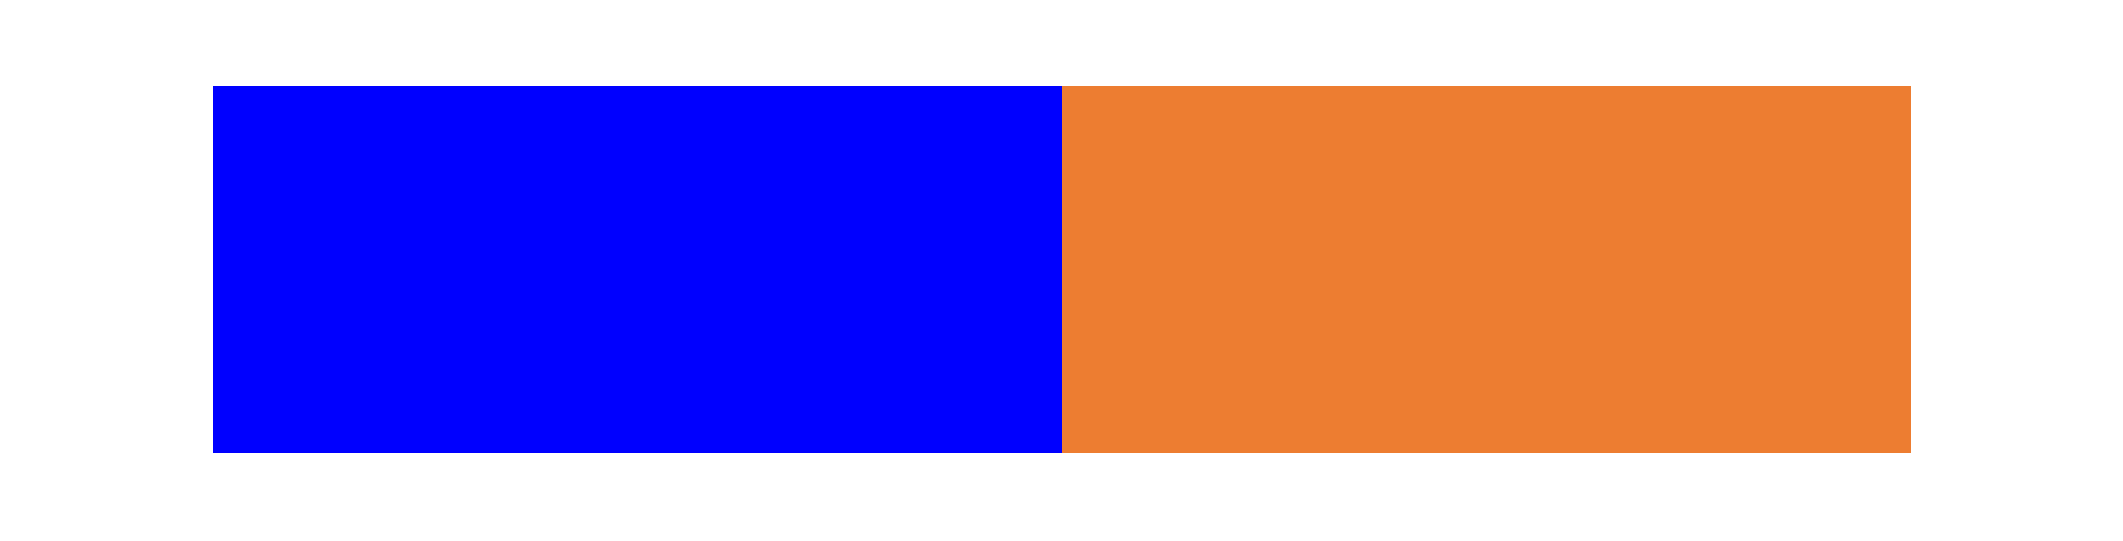 Coloring - Teorie barev